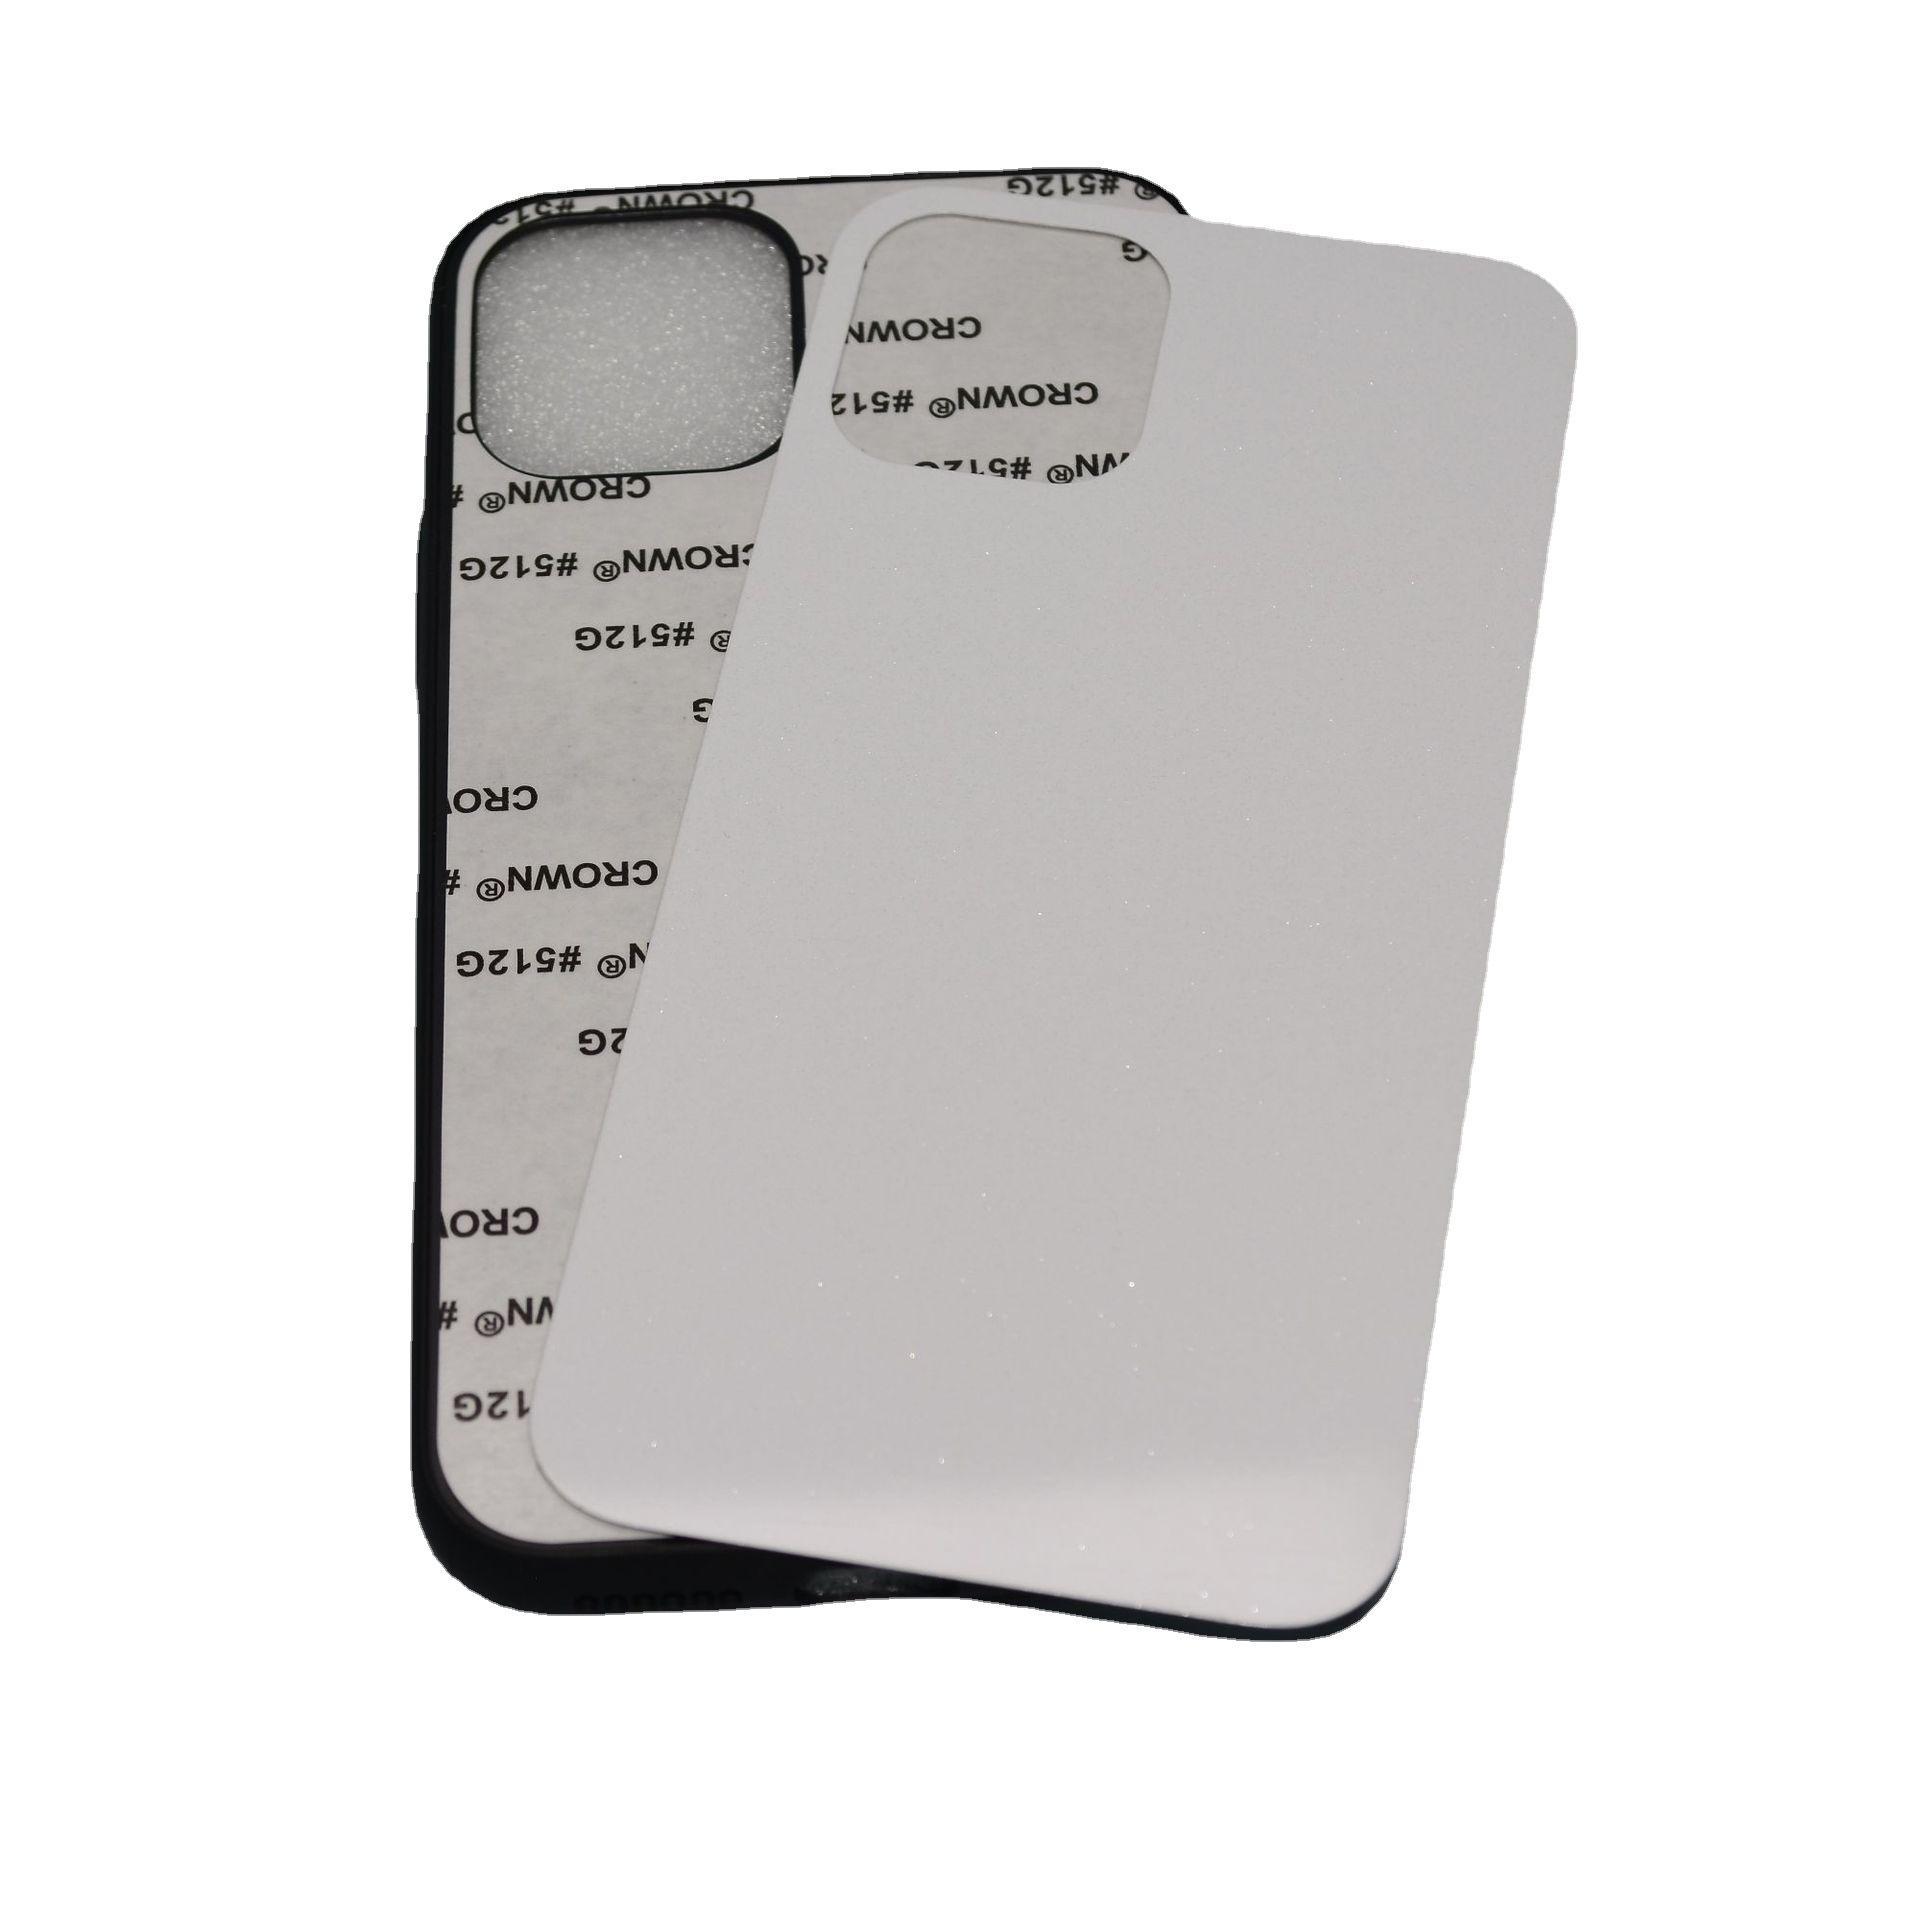 Gummi TPU + PC DIY Sublimation Hüllen Abdeckung für iPhone 13 12 11 PRO MAX XR XS 6 7 8 Plus mit Aluminiumblechkleber 100pcs / lot